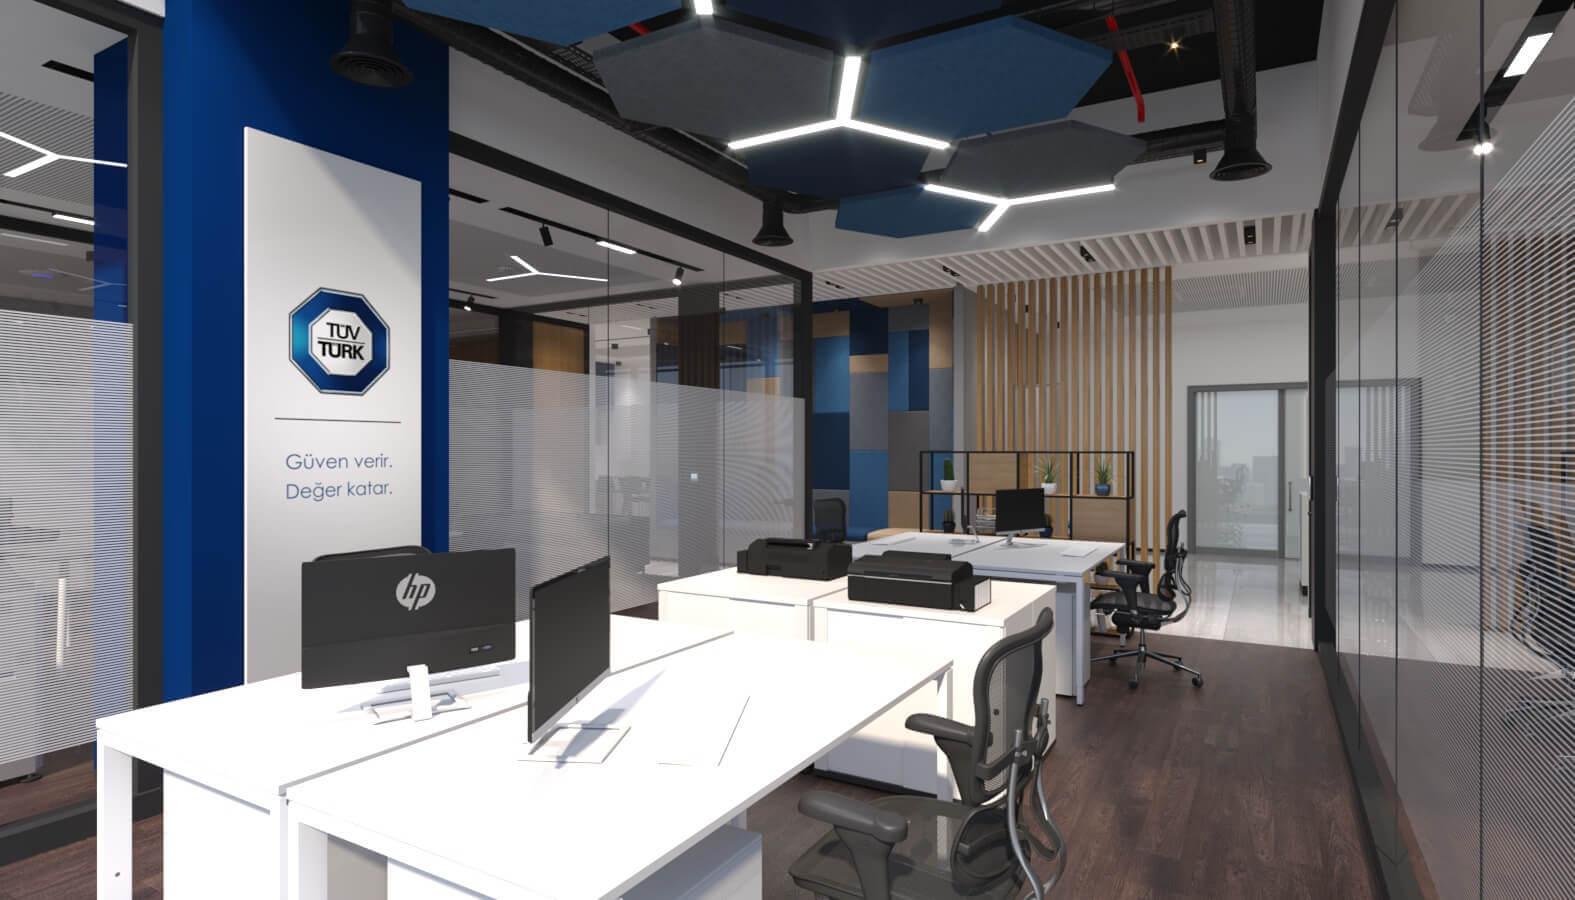 ofis içmimari 3837 Tüvtürk Ankara Ofis Ofisler